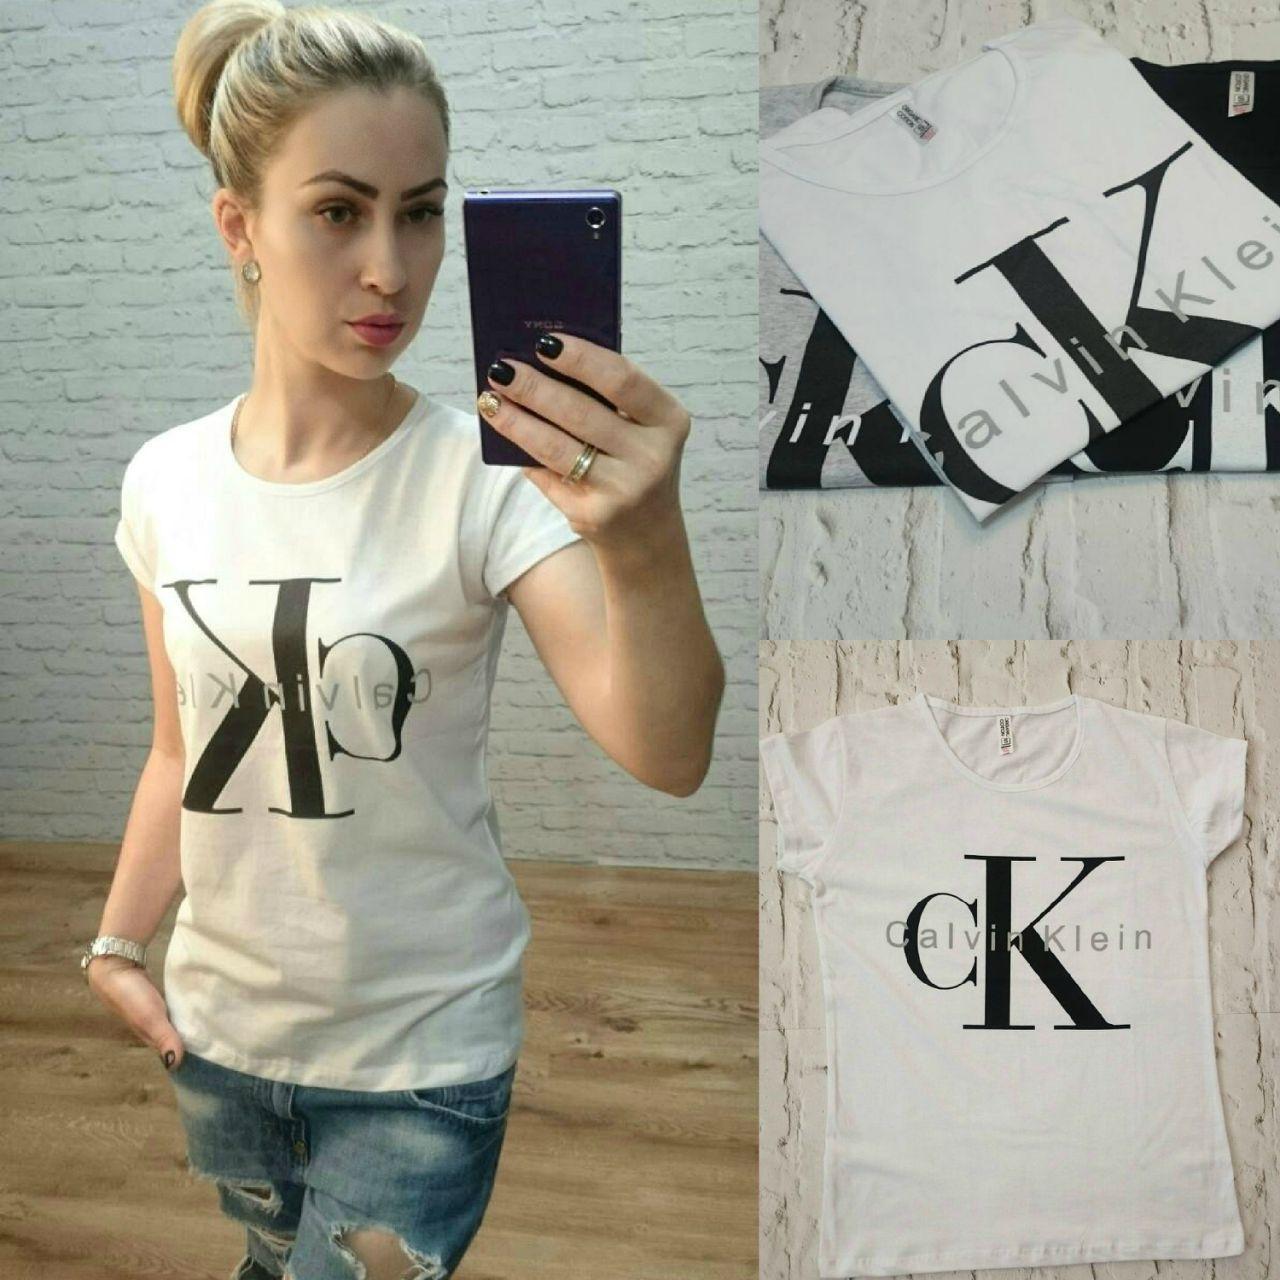 575bc91565e11 Женская футболка Calvin Klein Турция р. S,M,L оптом купить в Одессе ...